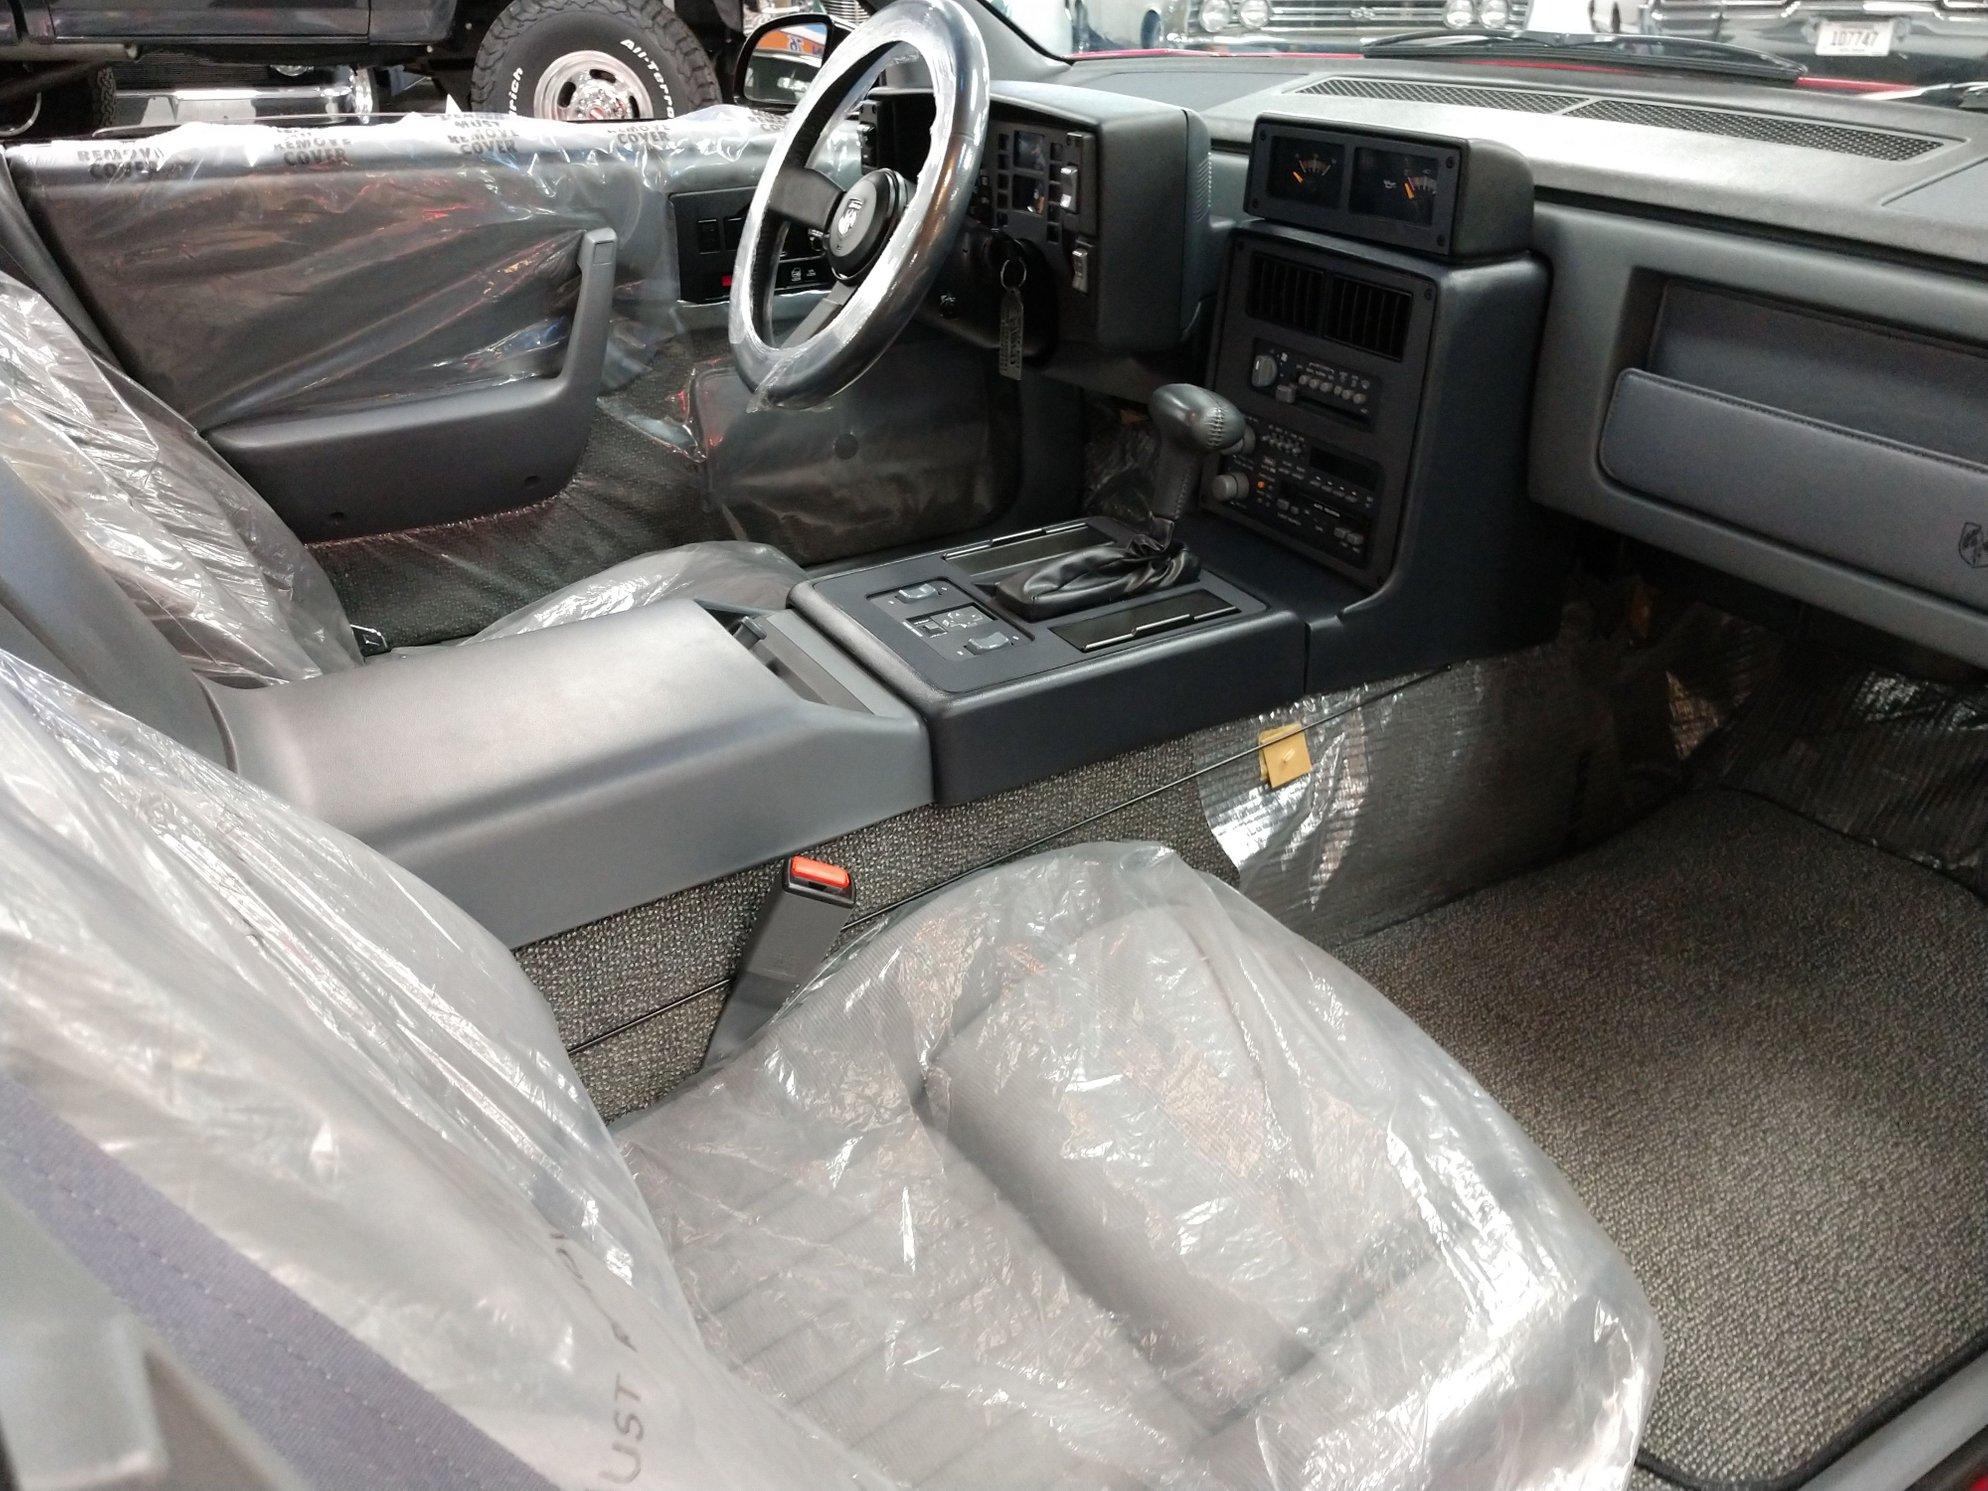 1988 pontiac fiero gt front interior